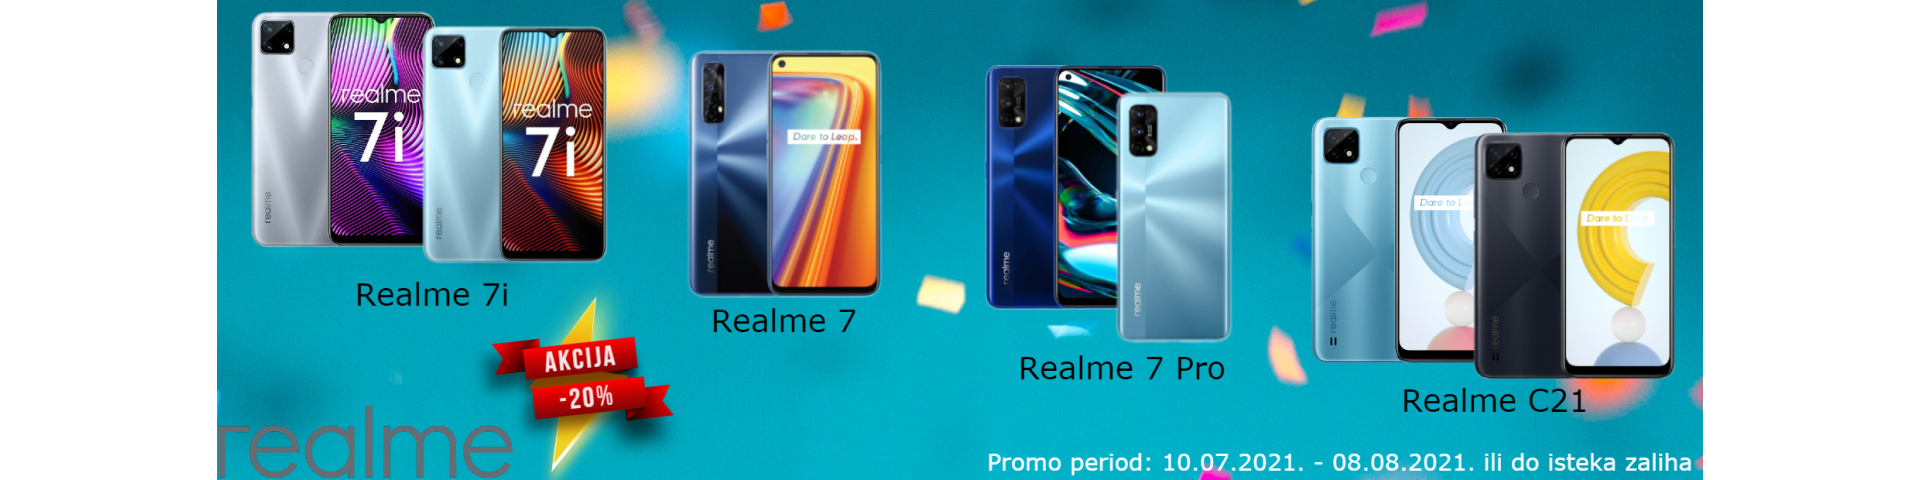 Realme -20% 10.07.2021. - 08.08.2021.